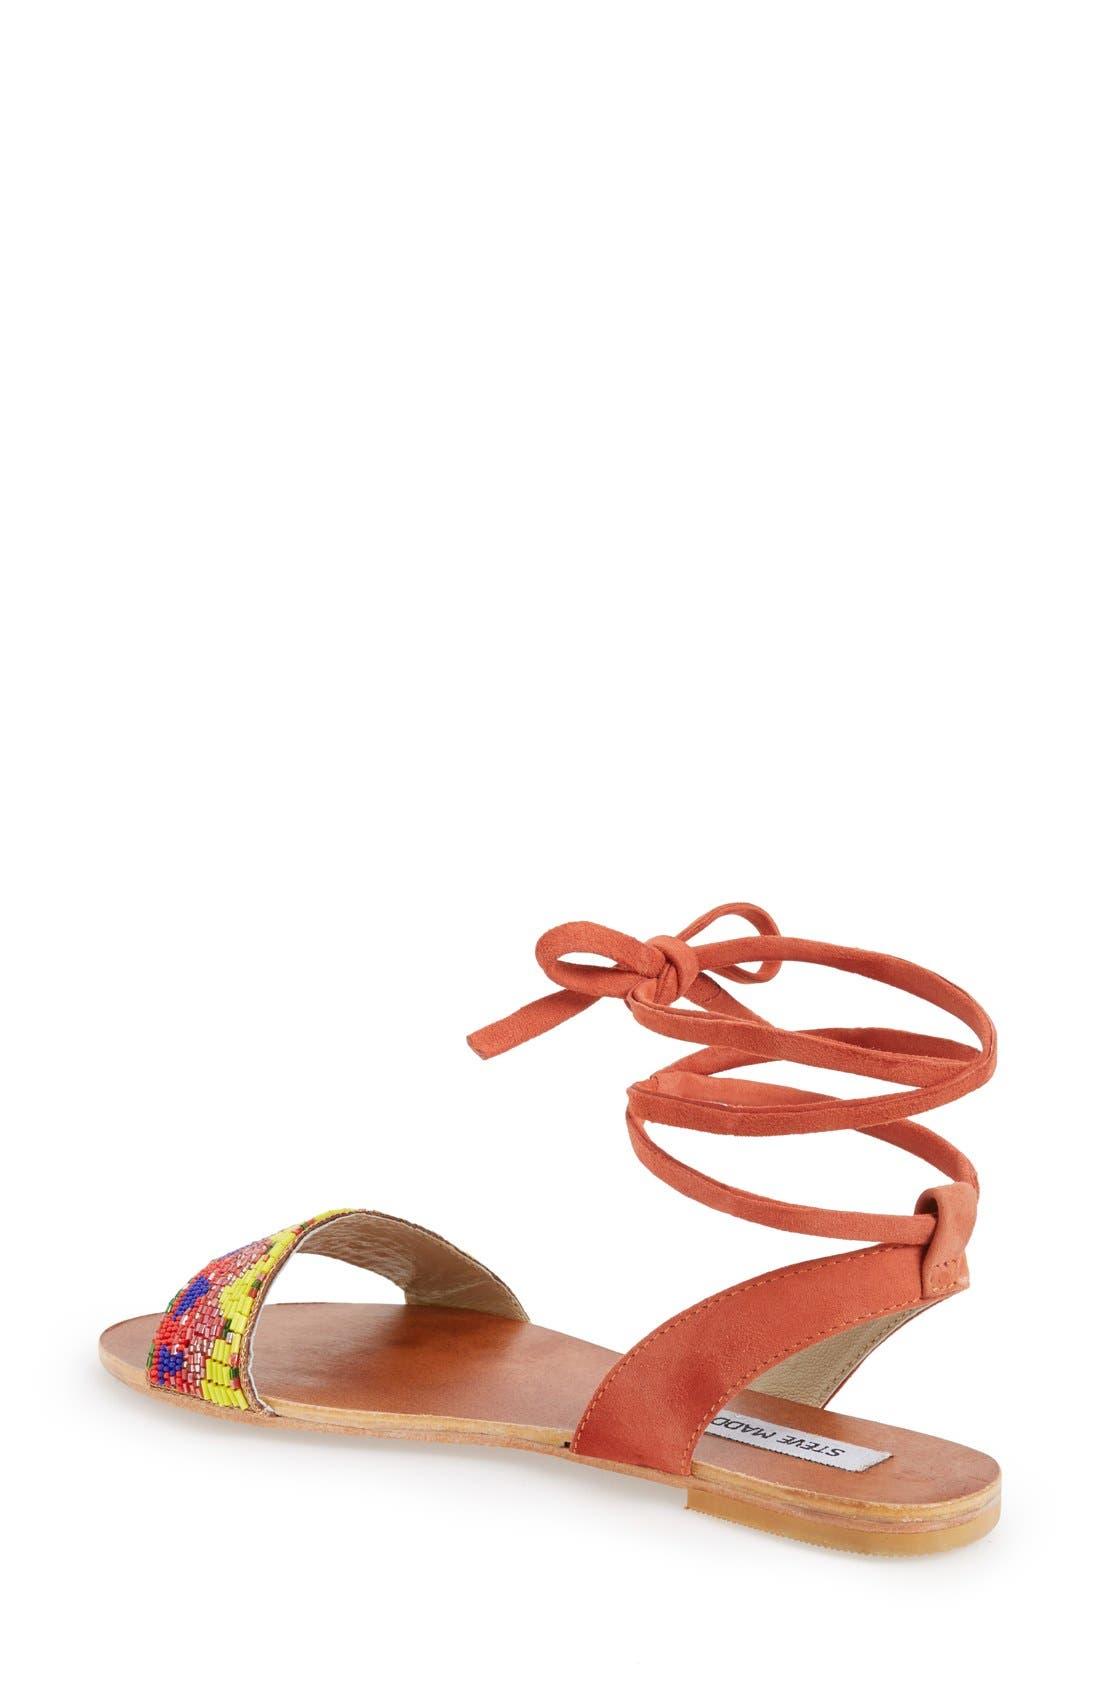 'Shaney' Beaded Wraparound Lace Sandal,                             Alternate thumbnail 2, color,                             Bright Multi